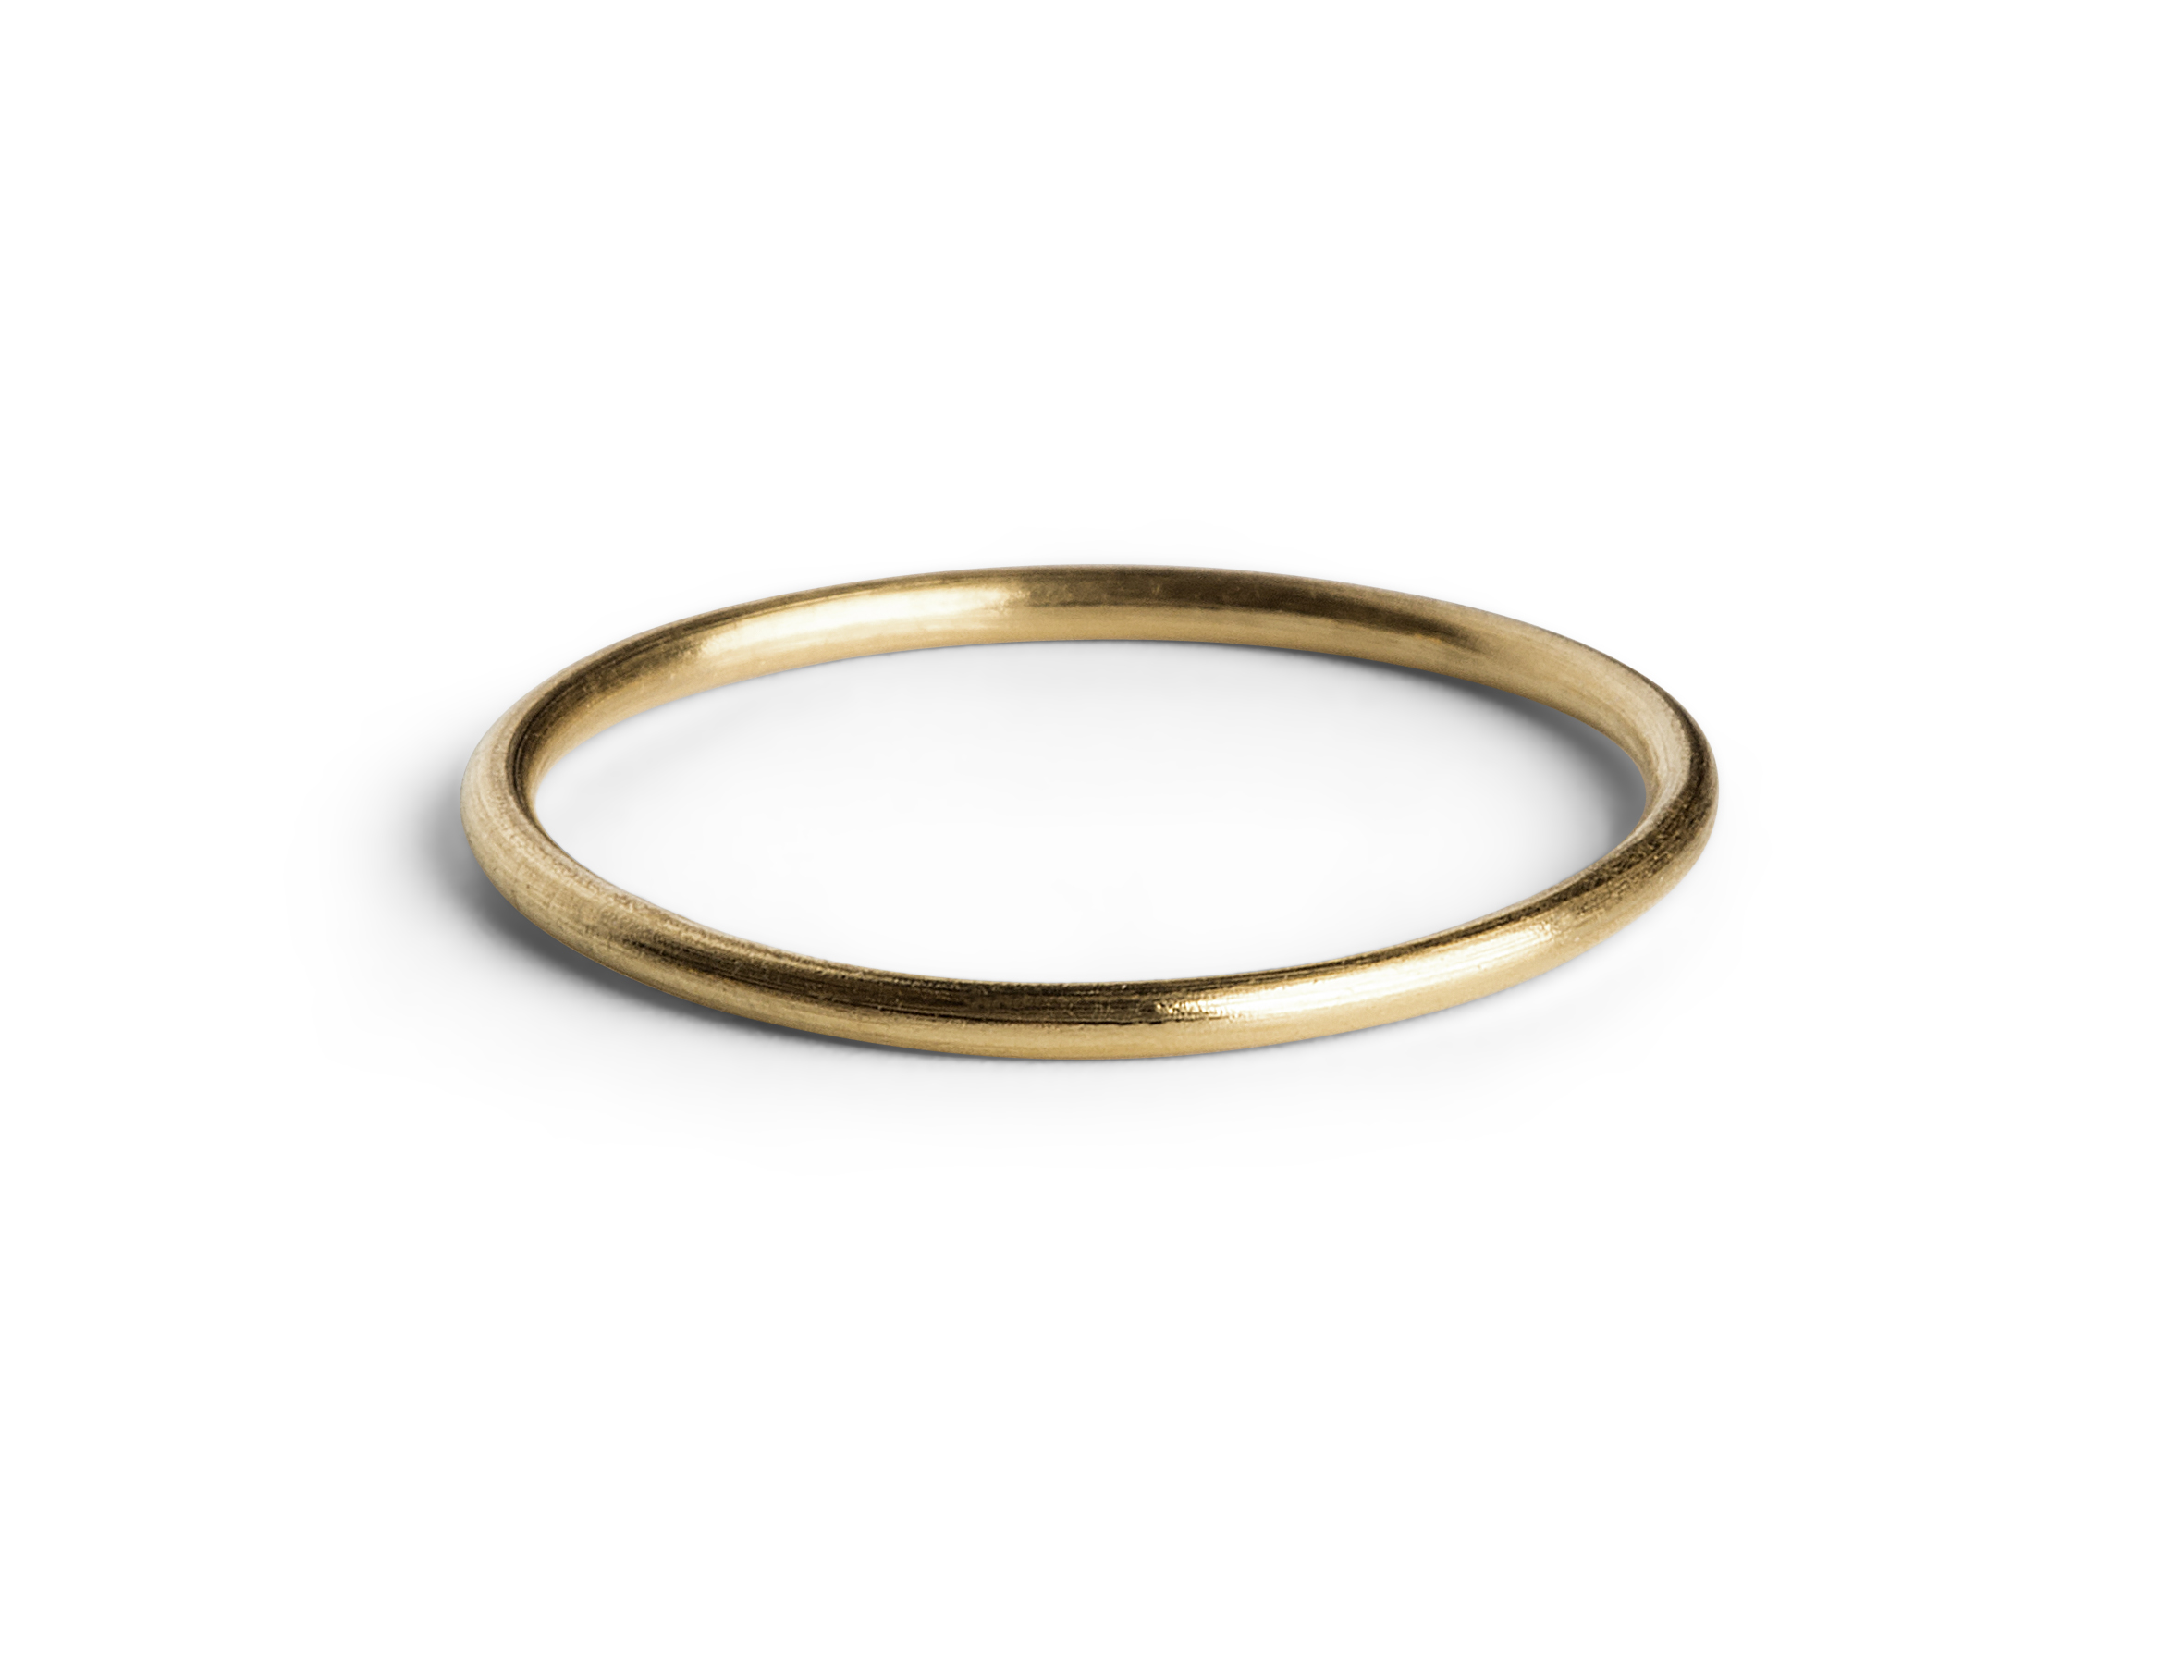 Jane Kønig Simple ring, guld, 51